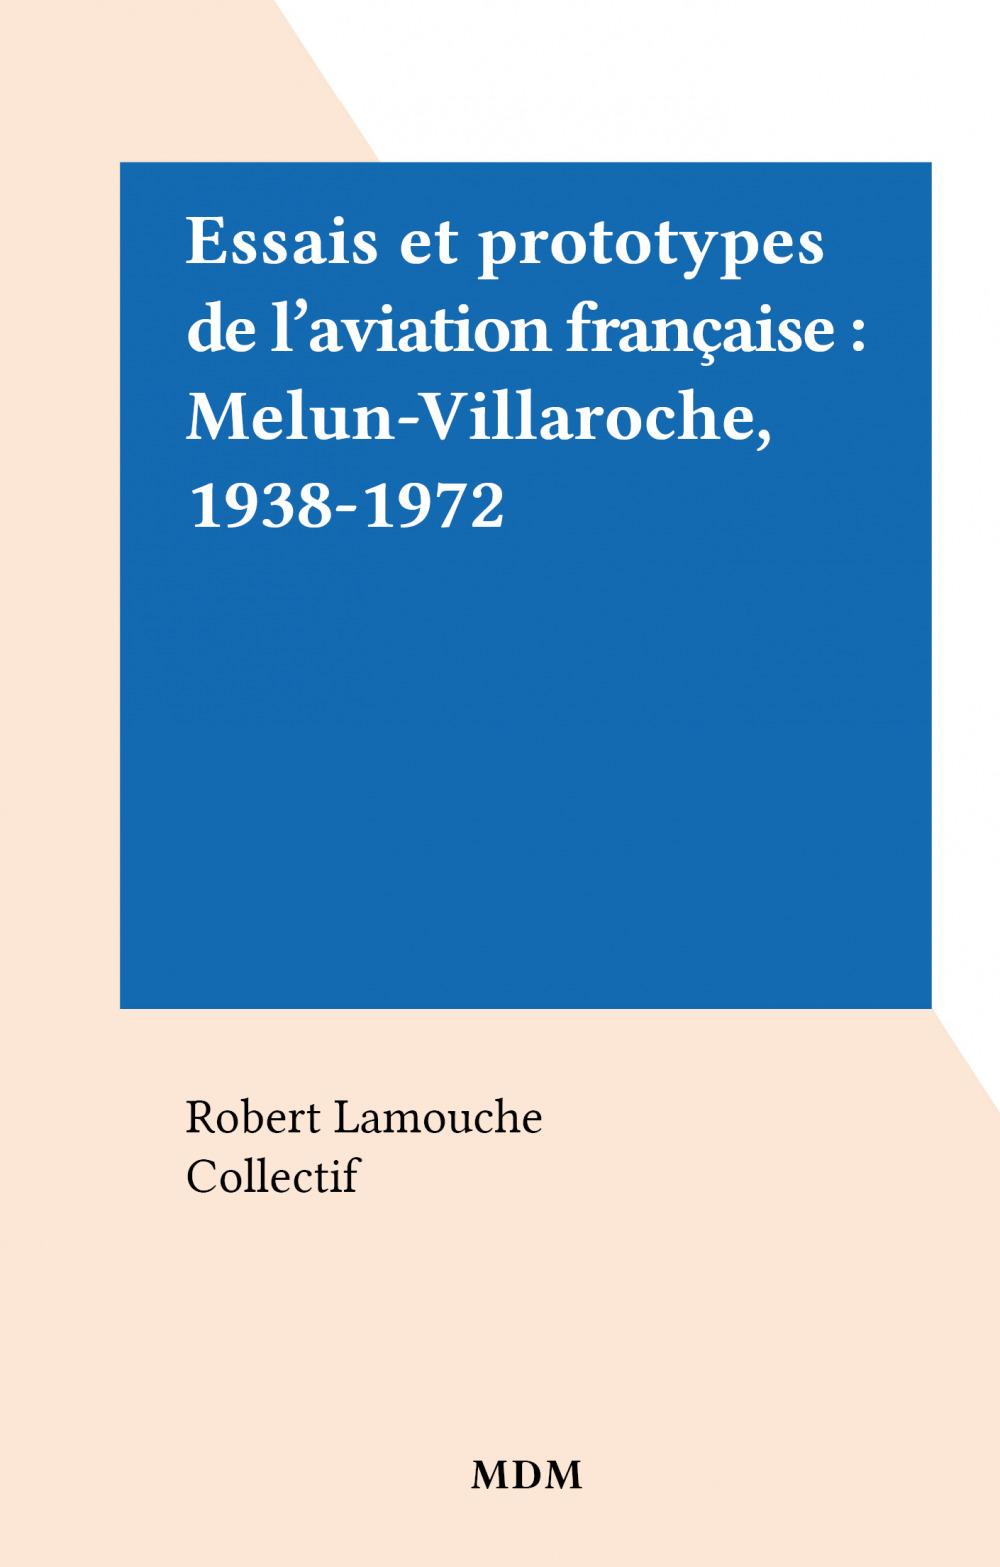 Essais et prototypes de l'aviation française : Melun-Villaroche, 1938-1972  - Robert Lamouche